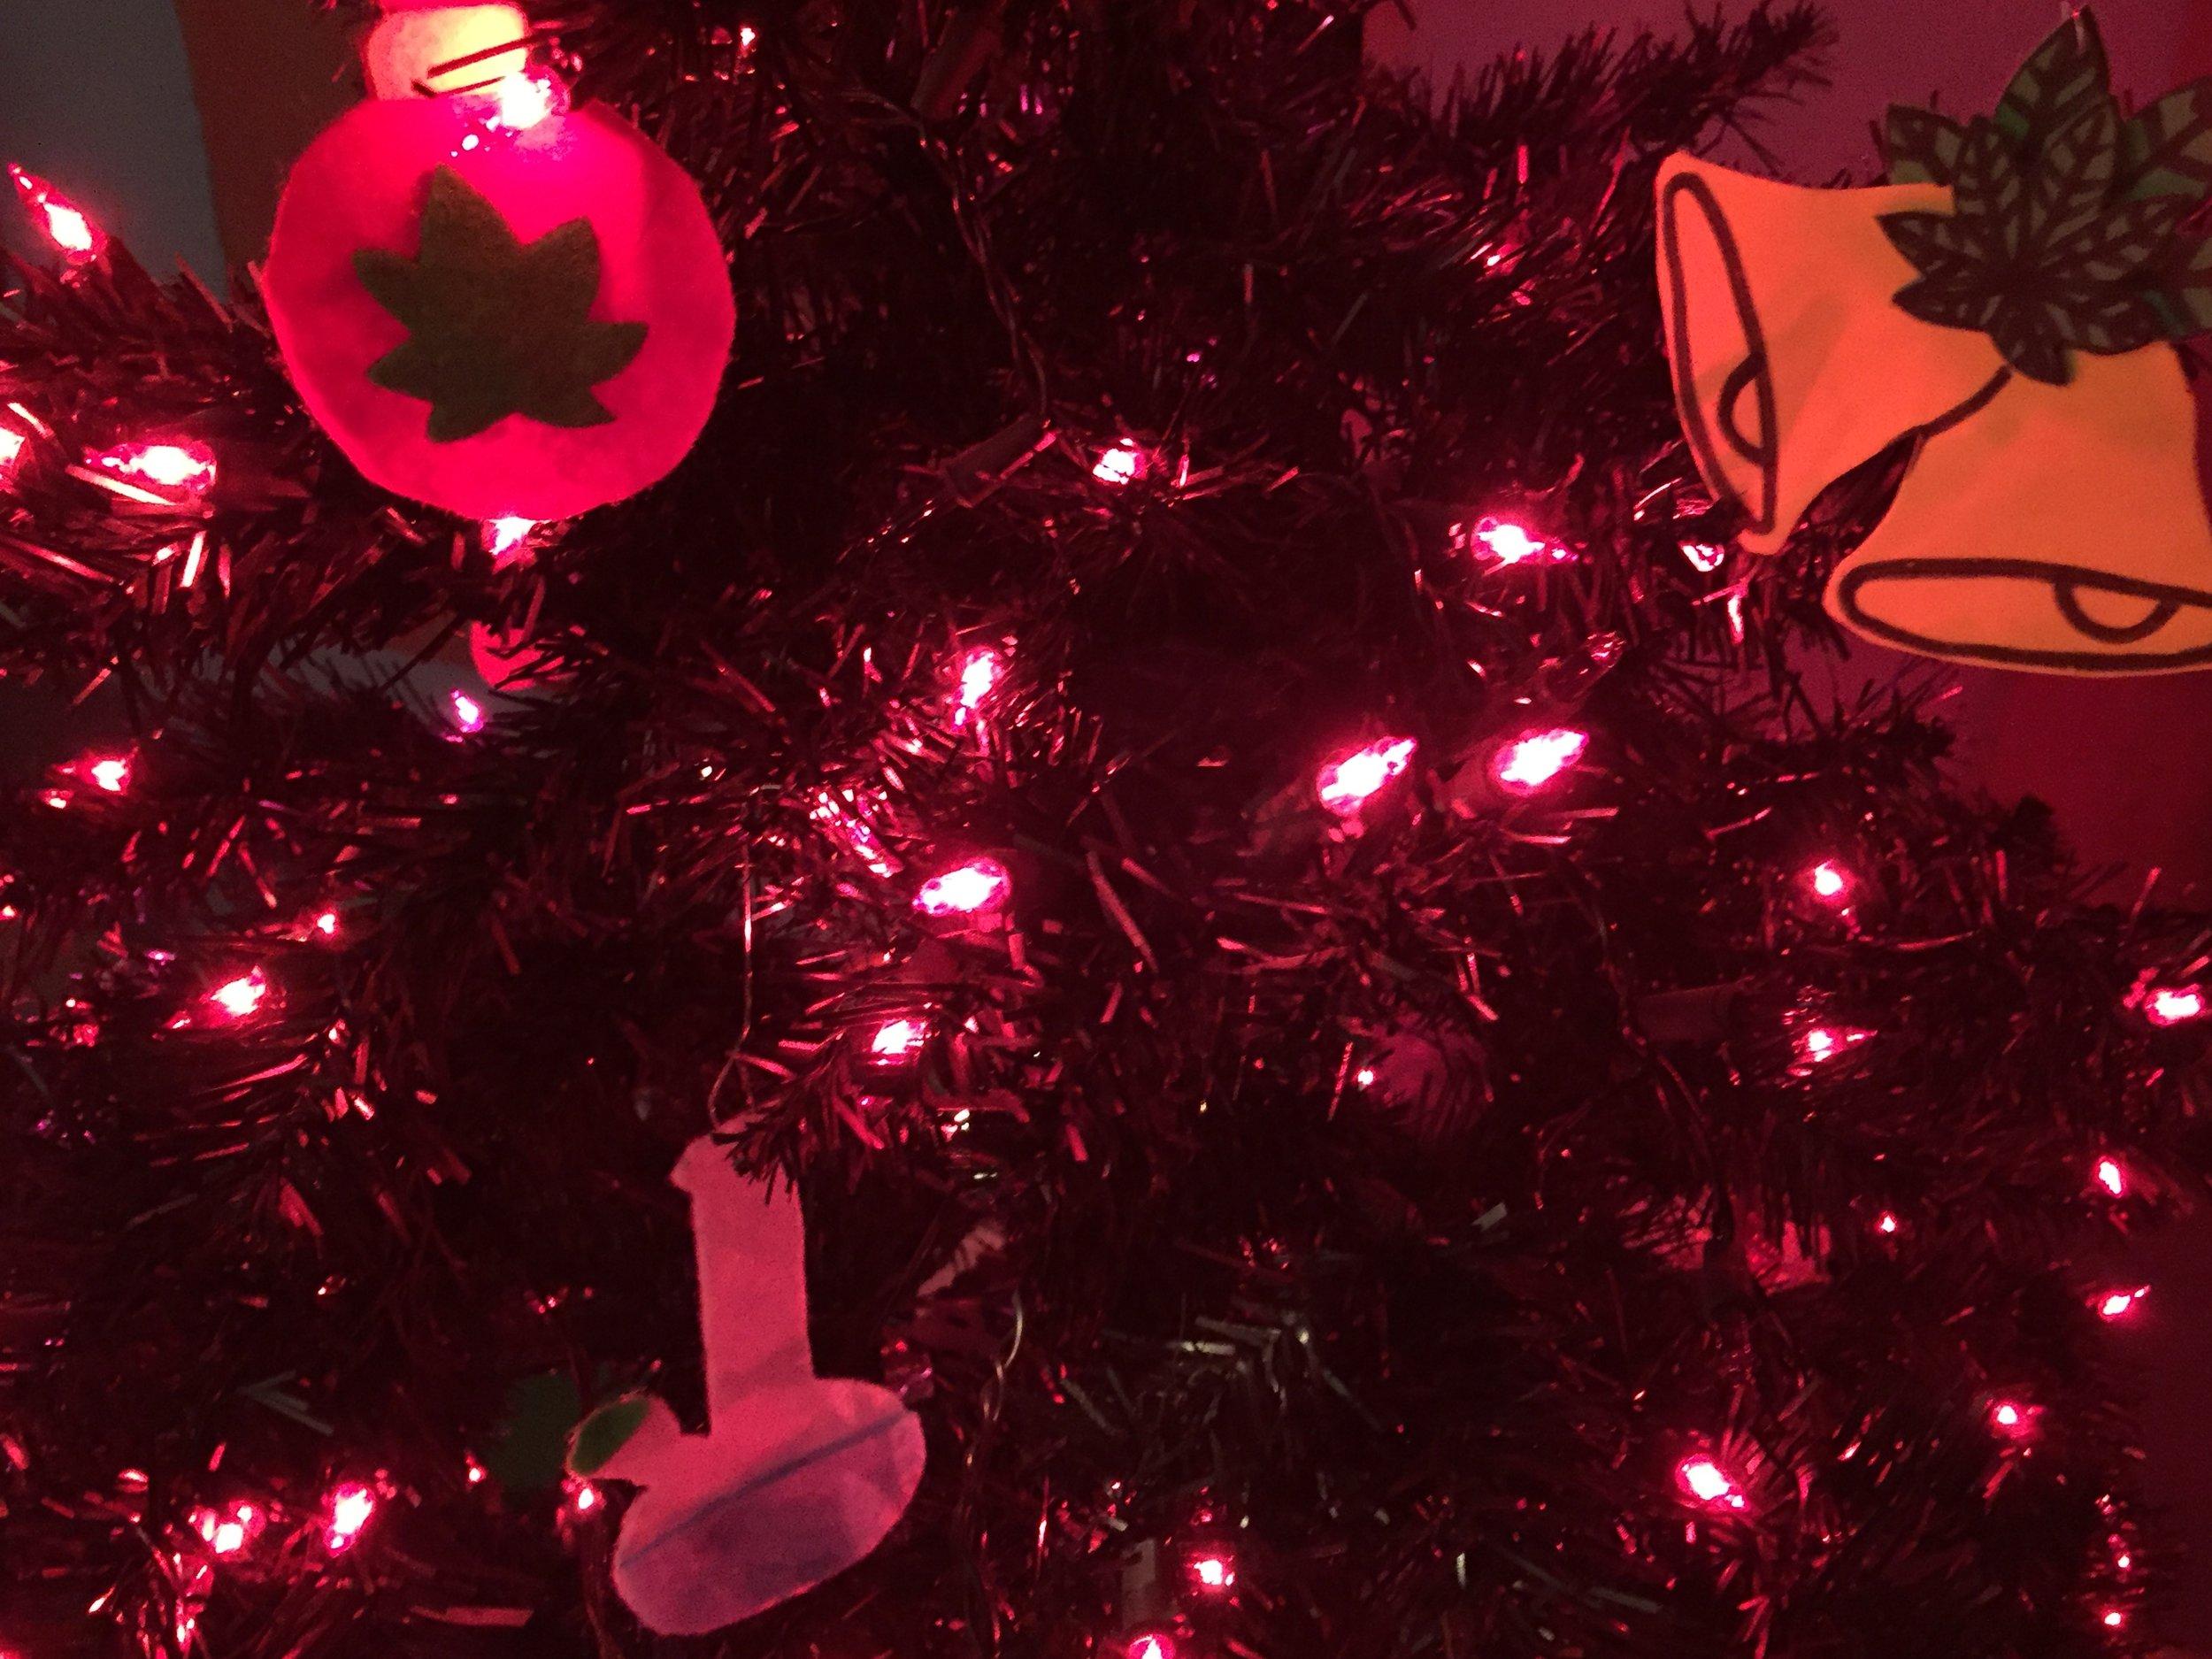 DIY Marijuana Themed Christmas (Kushmas) Ornaments Stoner Decorations